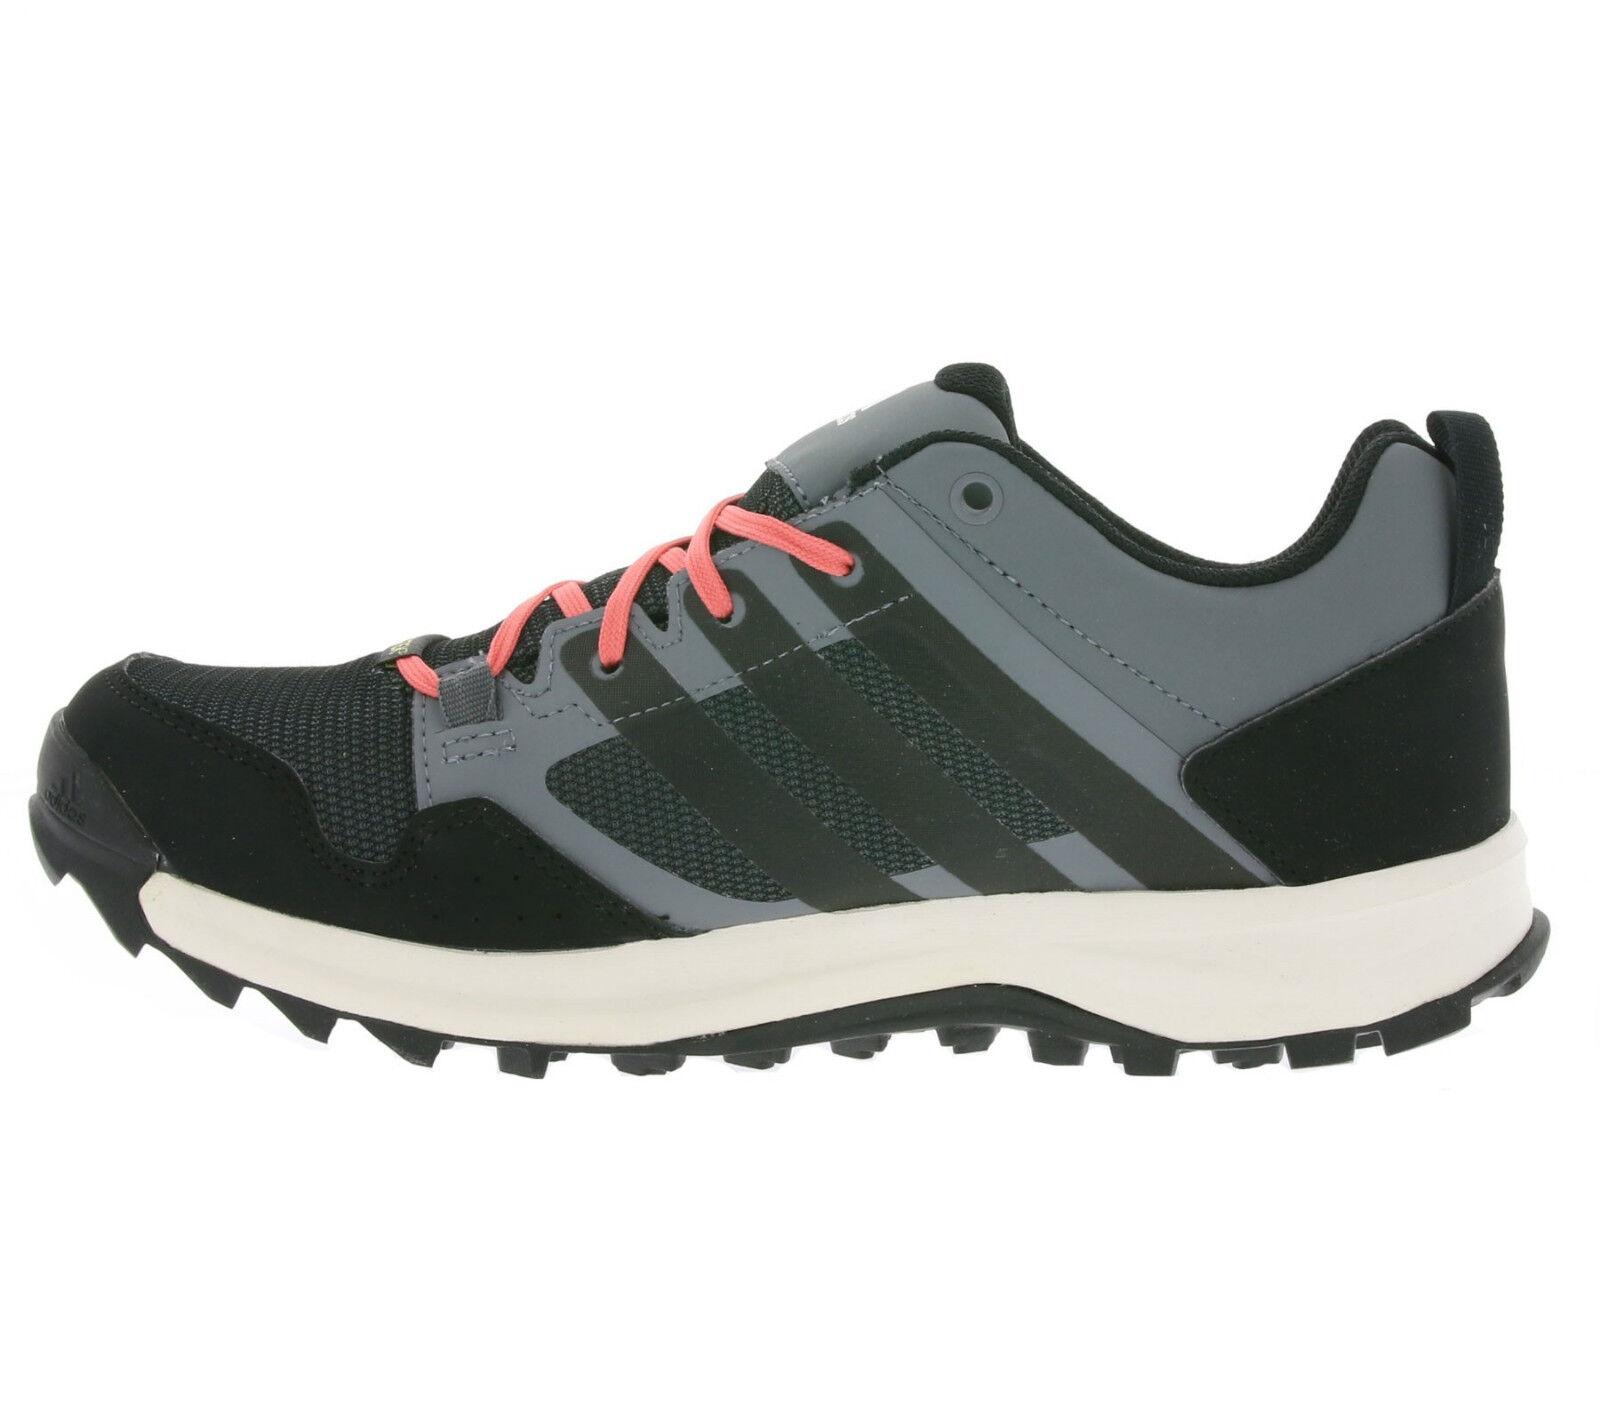 Chaussure Trail Femme ADIDAS Kanadia 7TR Gore-Tex Running Montagne Outdoor